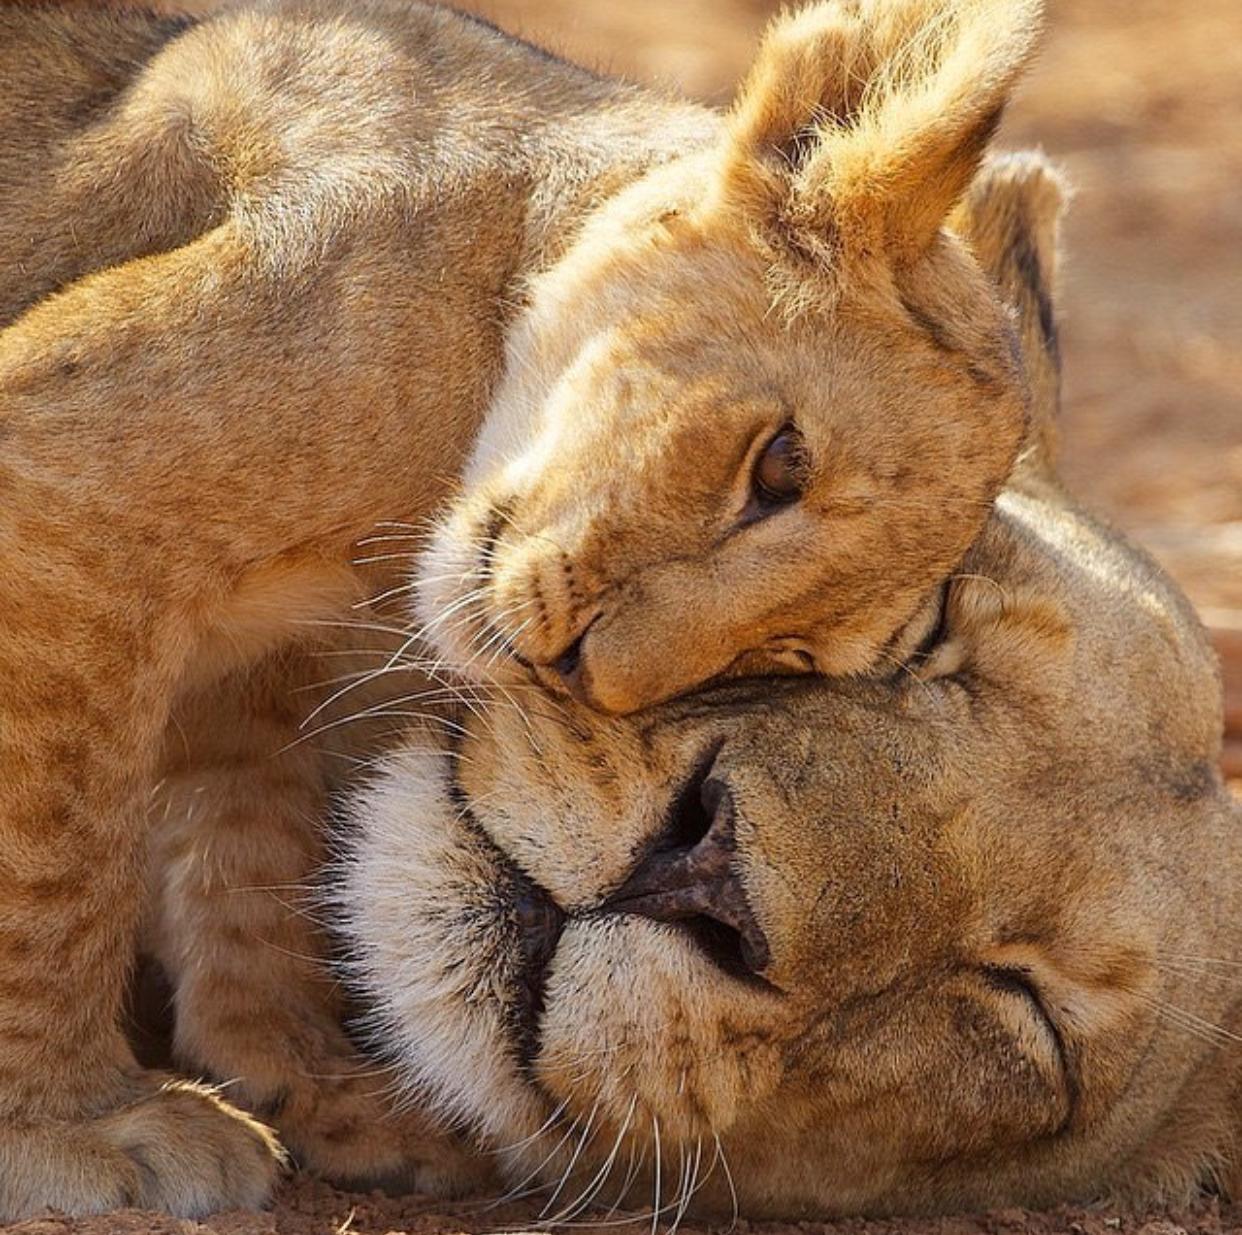 Картинки обниманий животных